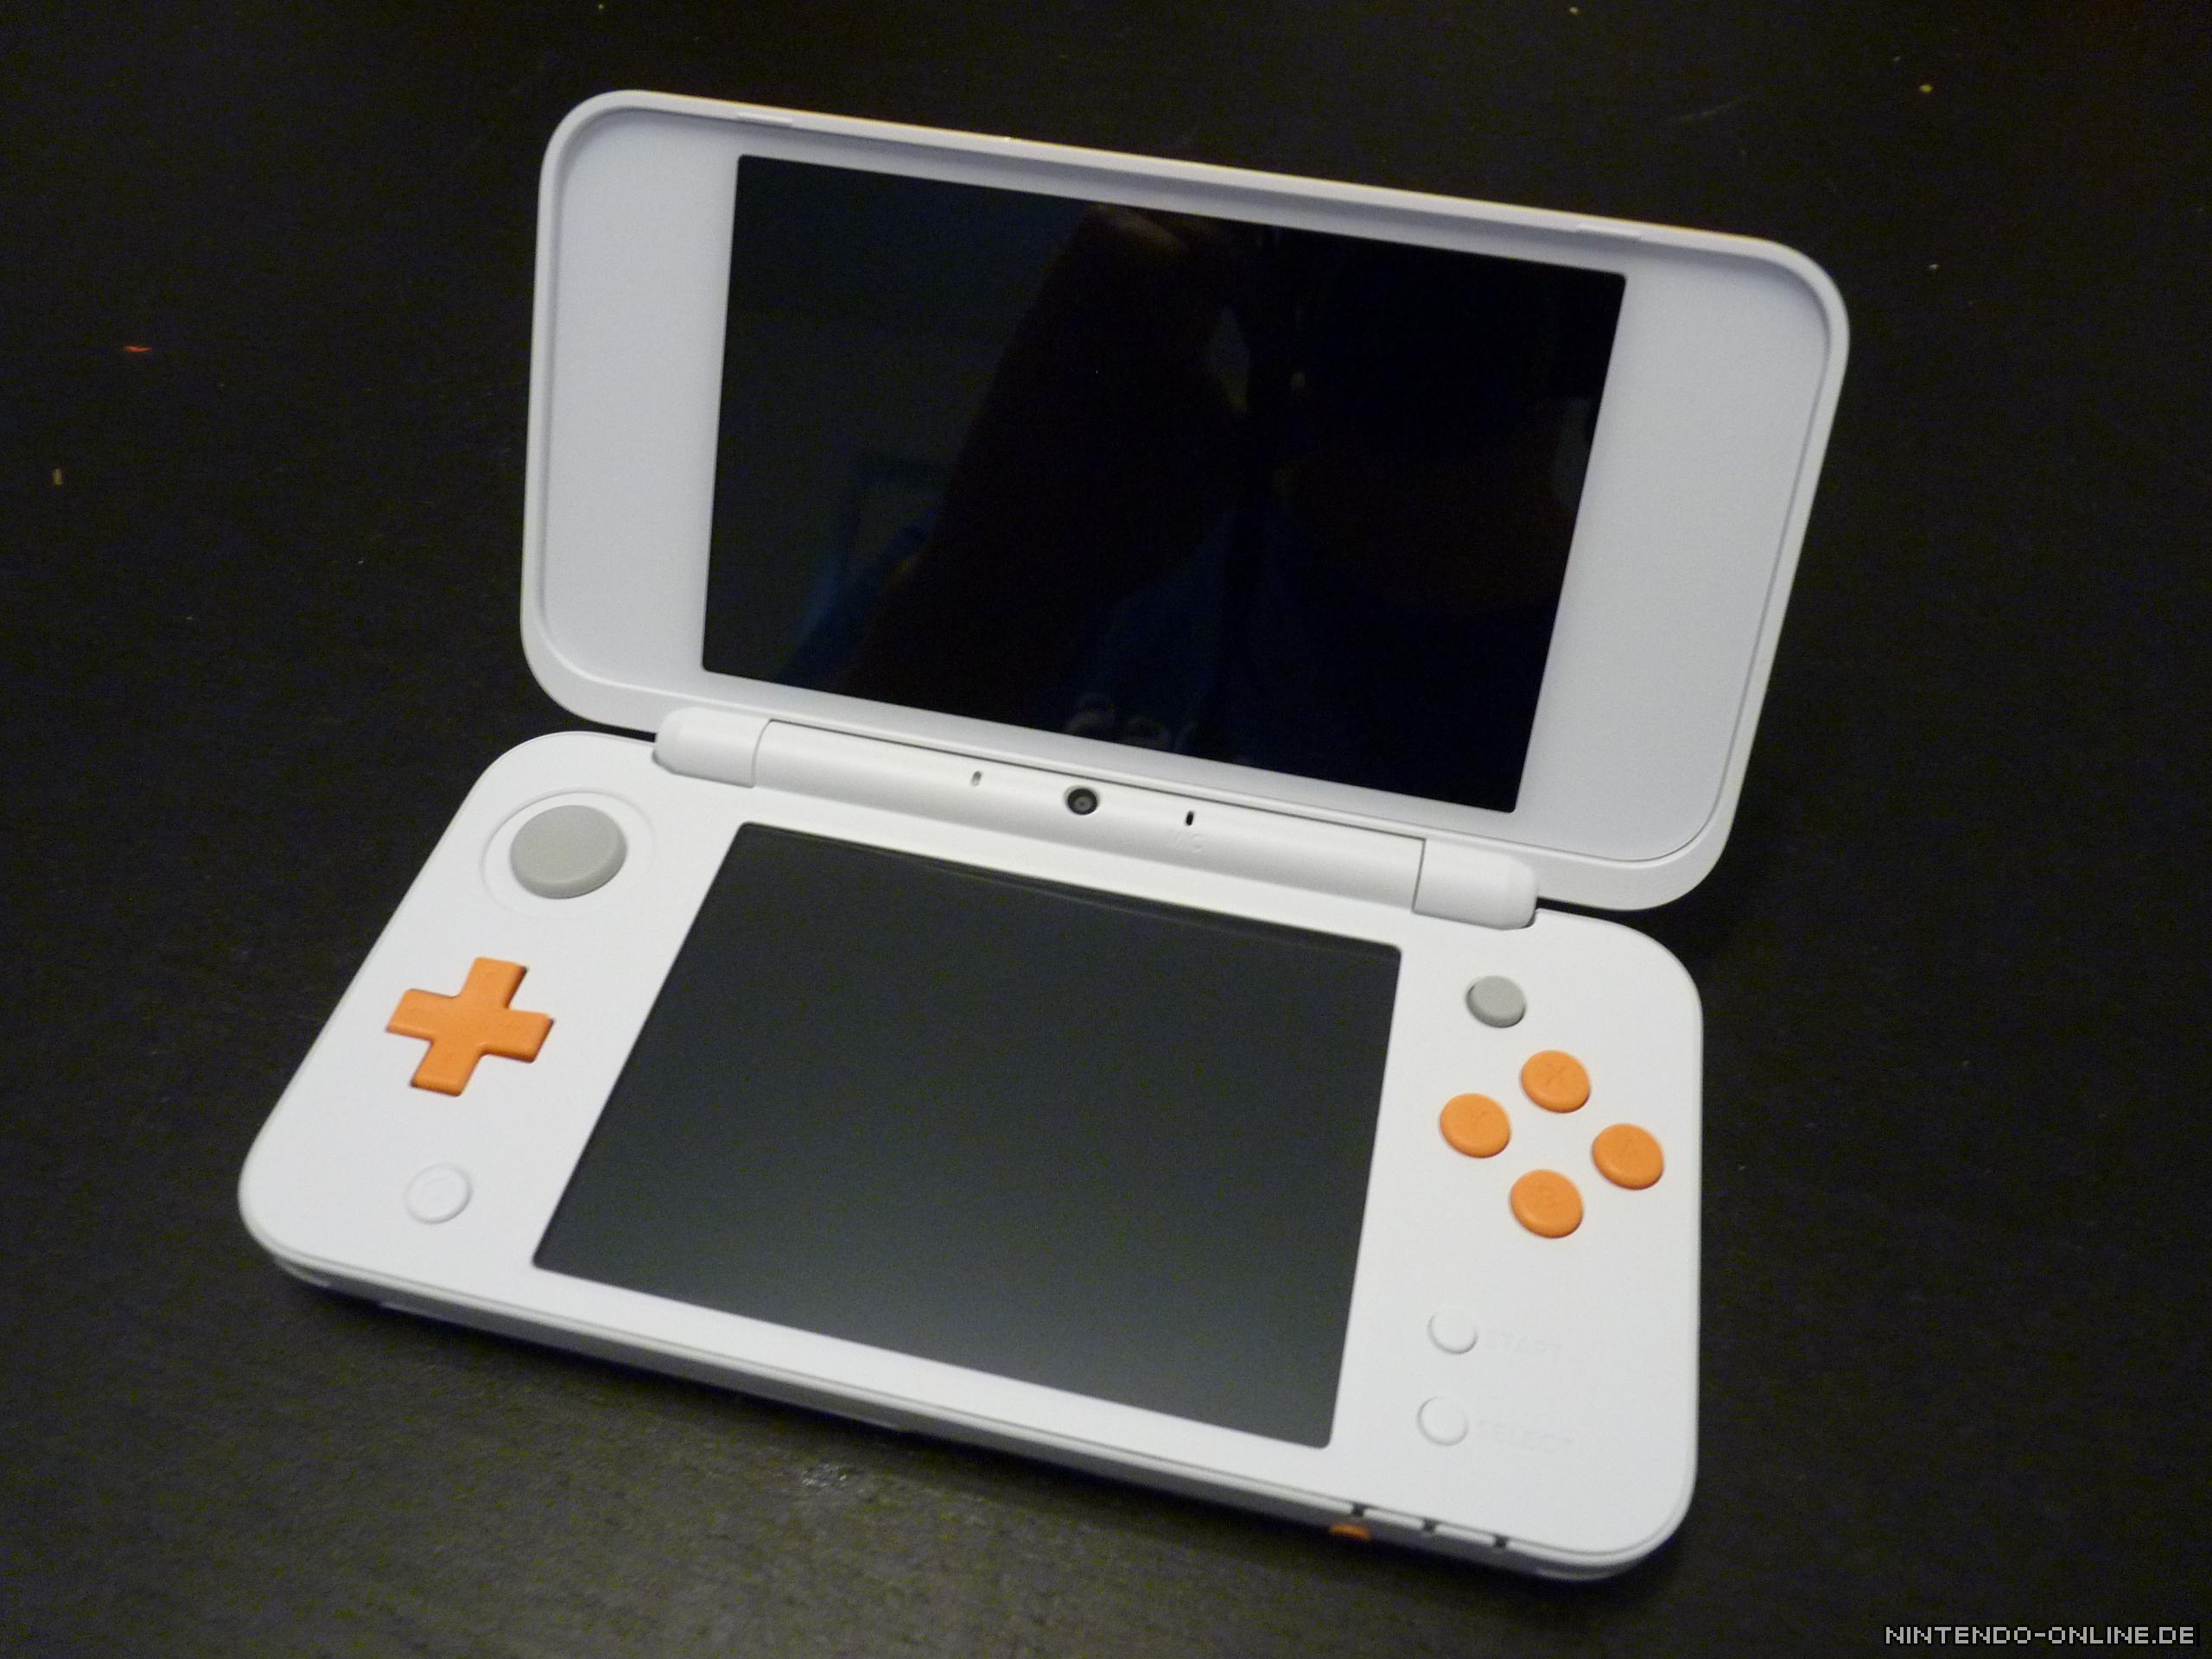 Nintendo 3ds Xl Sd Karte.New Nintendo 2ds Xl Nintendo Online De